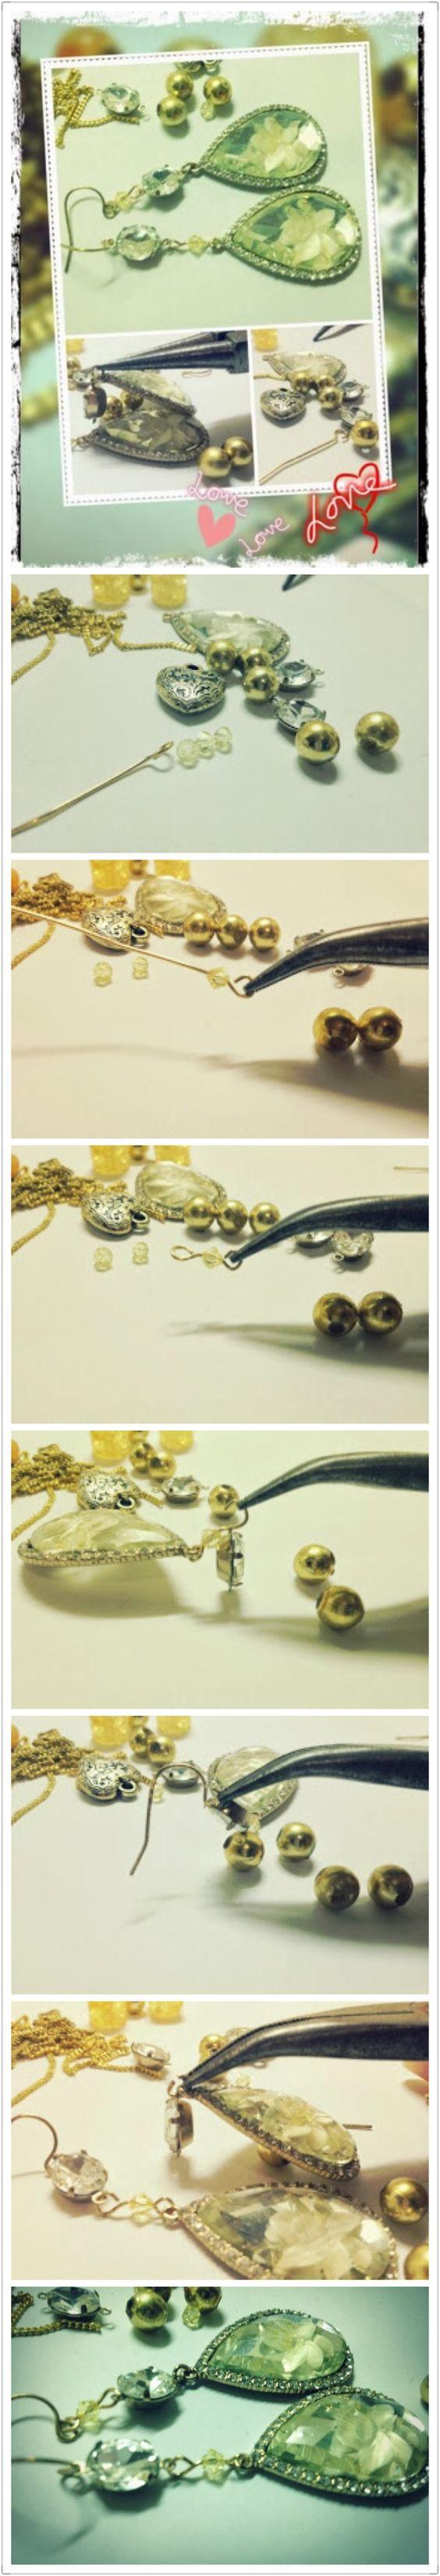 Yellow crystal earring  http://siusally.blogspot.hk/2013/12/salleeejewelry-golden-floral-earrings-w.html?m=1